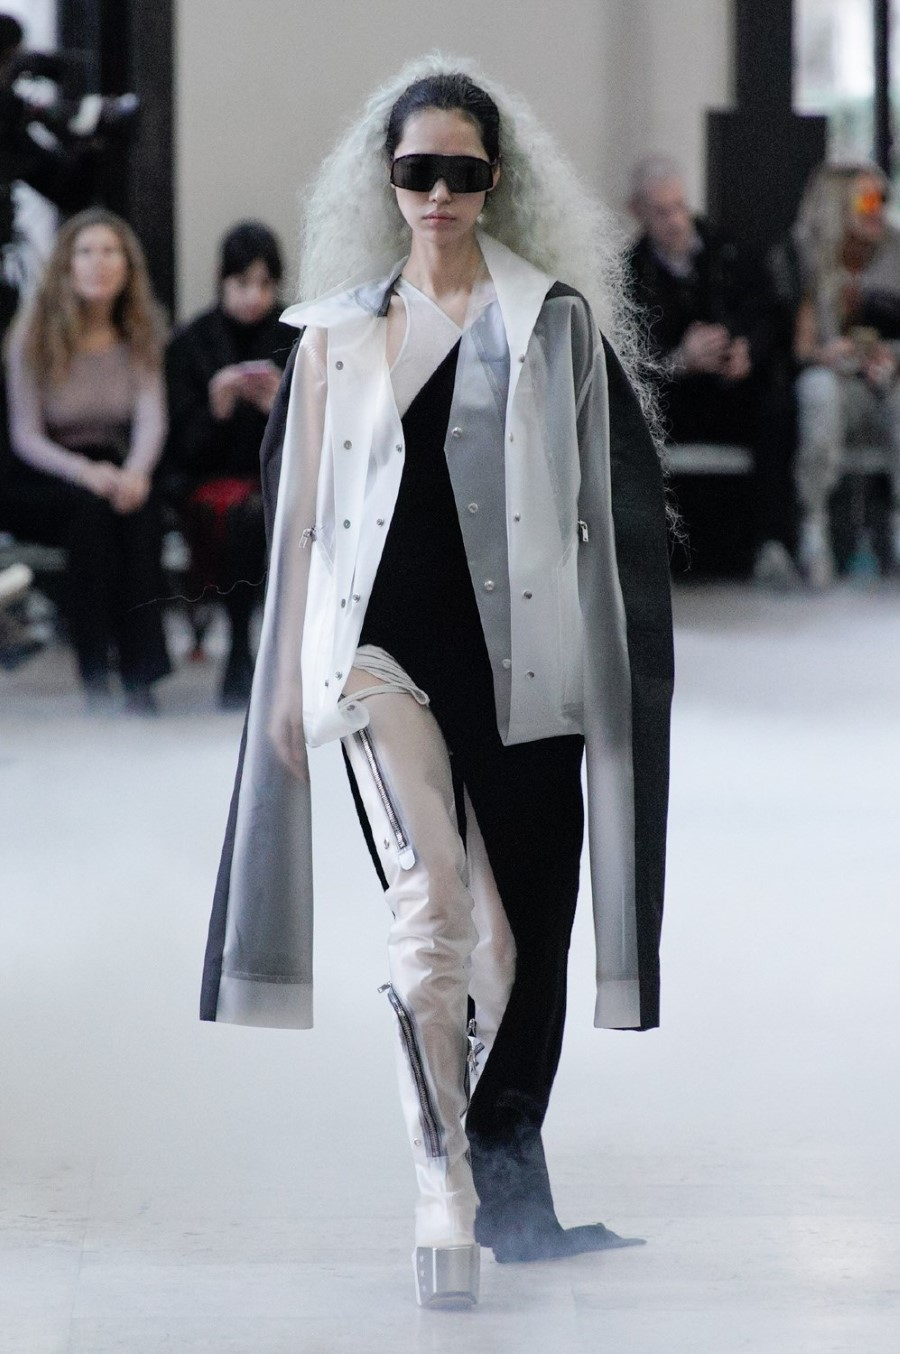 Rick Owens - Fall Winter 2020 - Paris Fashion WeekRick Owens - Fall Winter 2020 - Paris Fashion Week